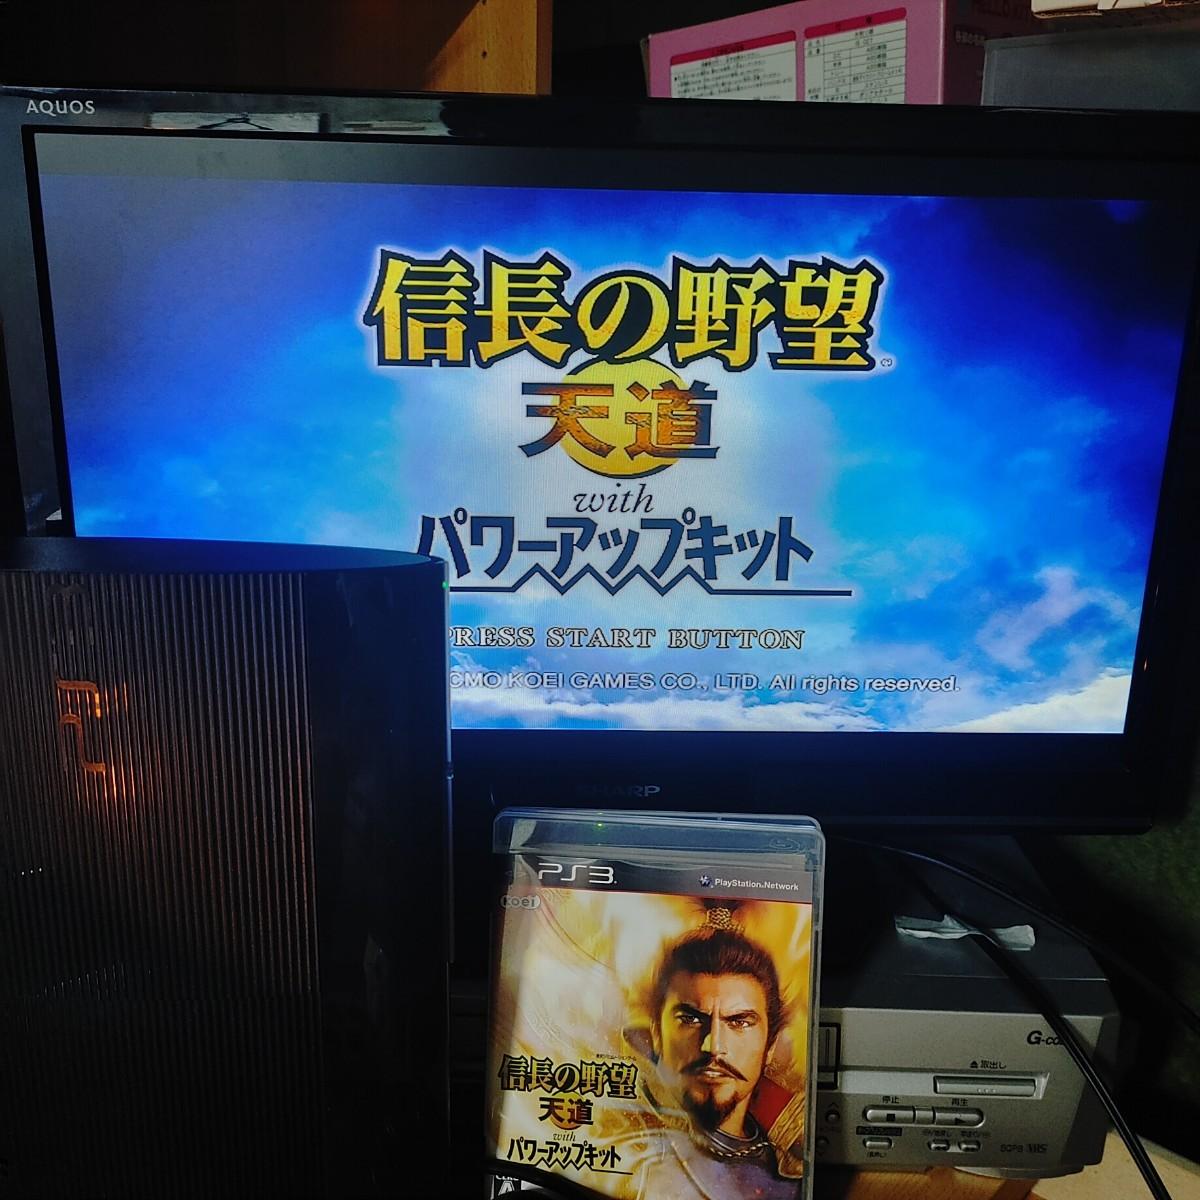 PS3 信長の野望 天童 with パワーアップキット